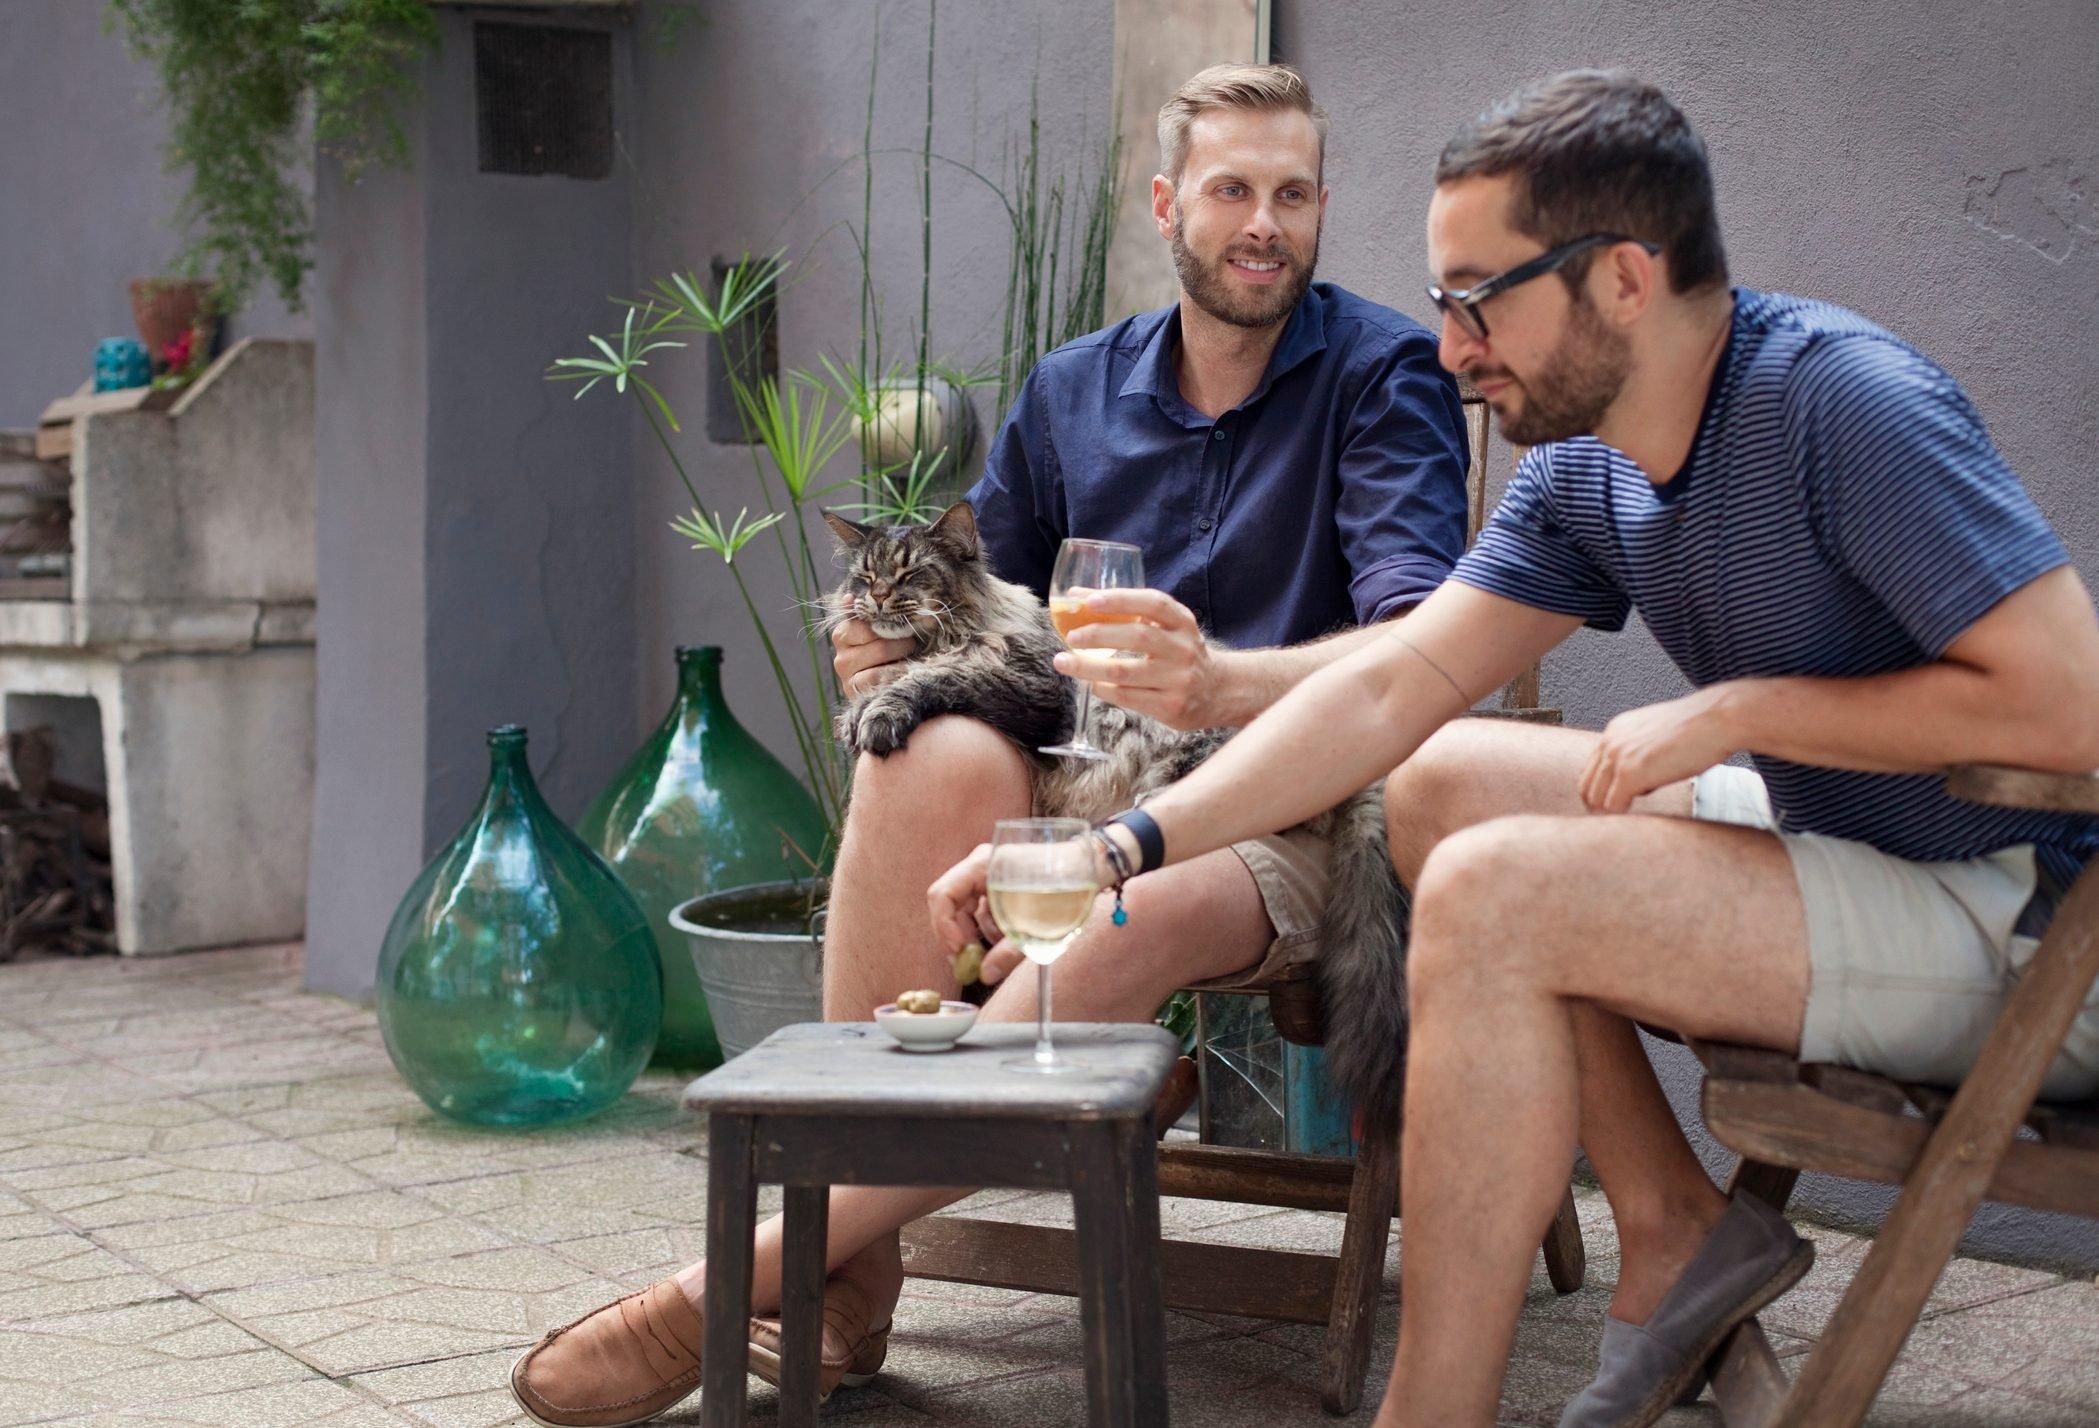 two men enjoying drinks on their terrace